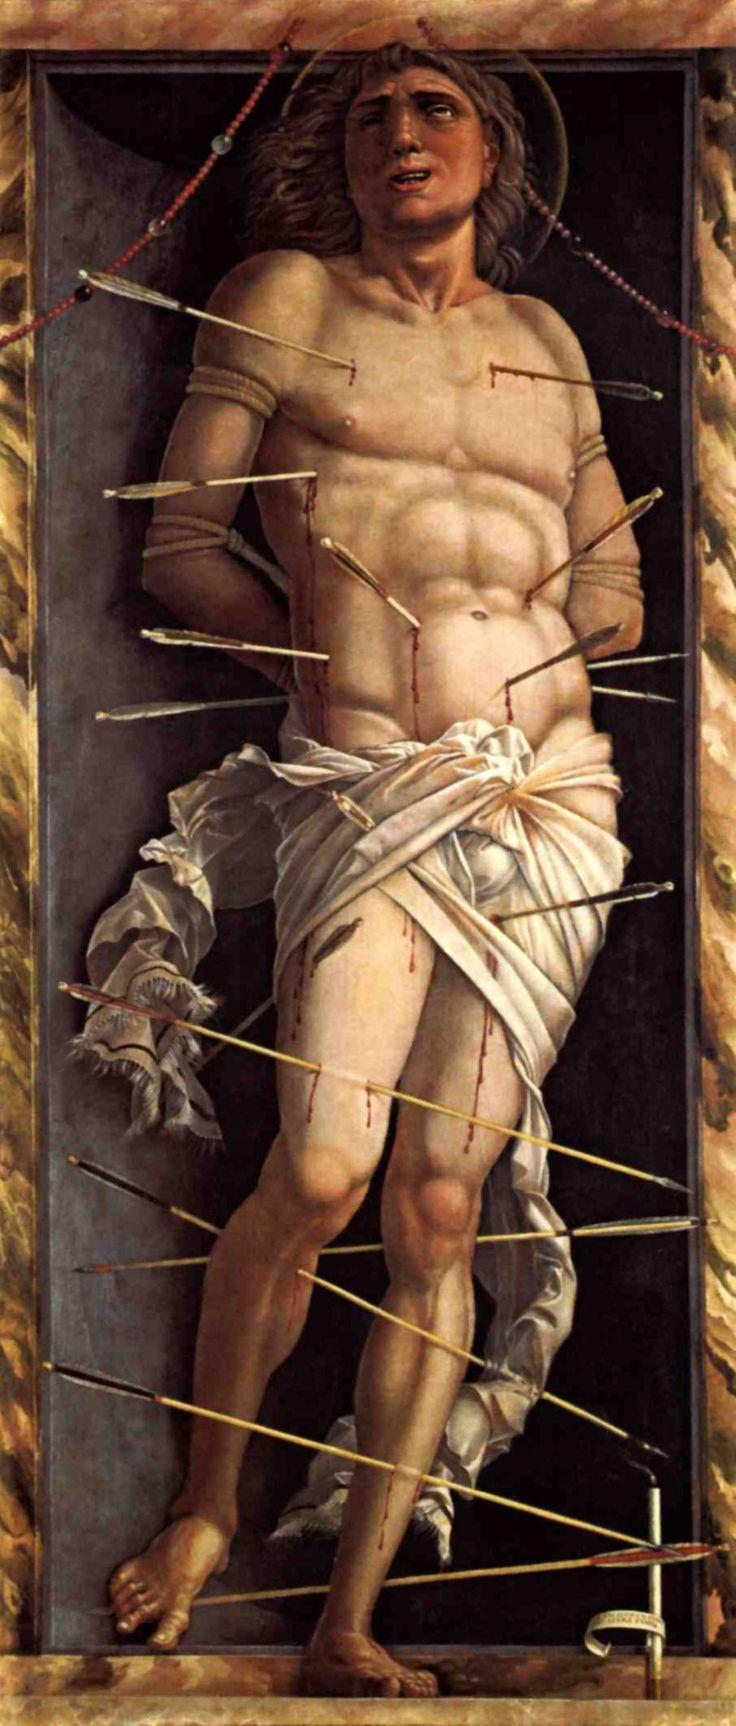 The Martyrdom of St. Sebastian, Andrea Mantegna, 1506